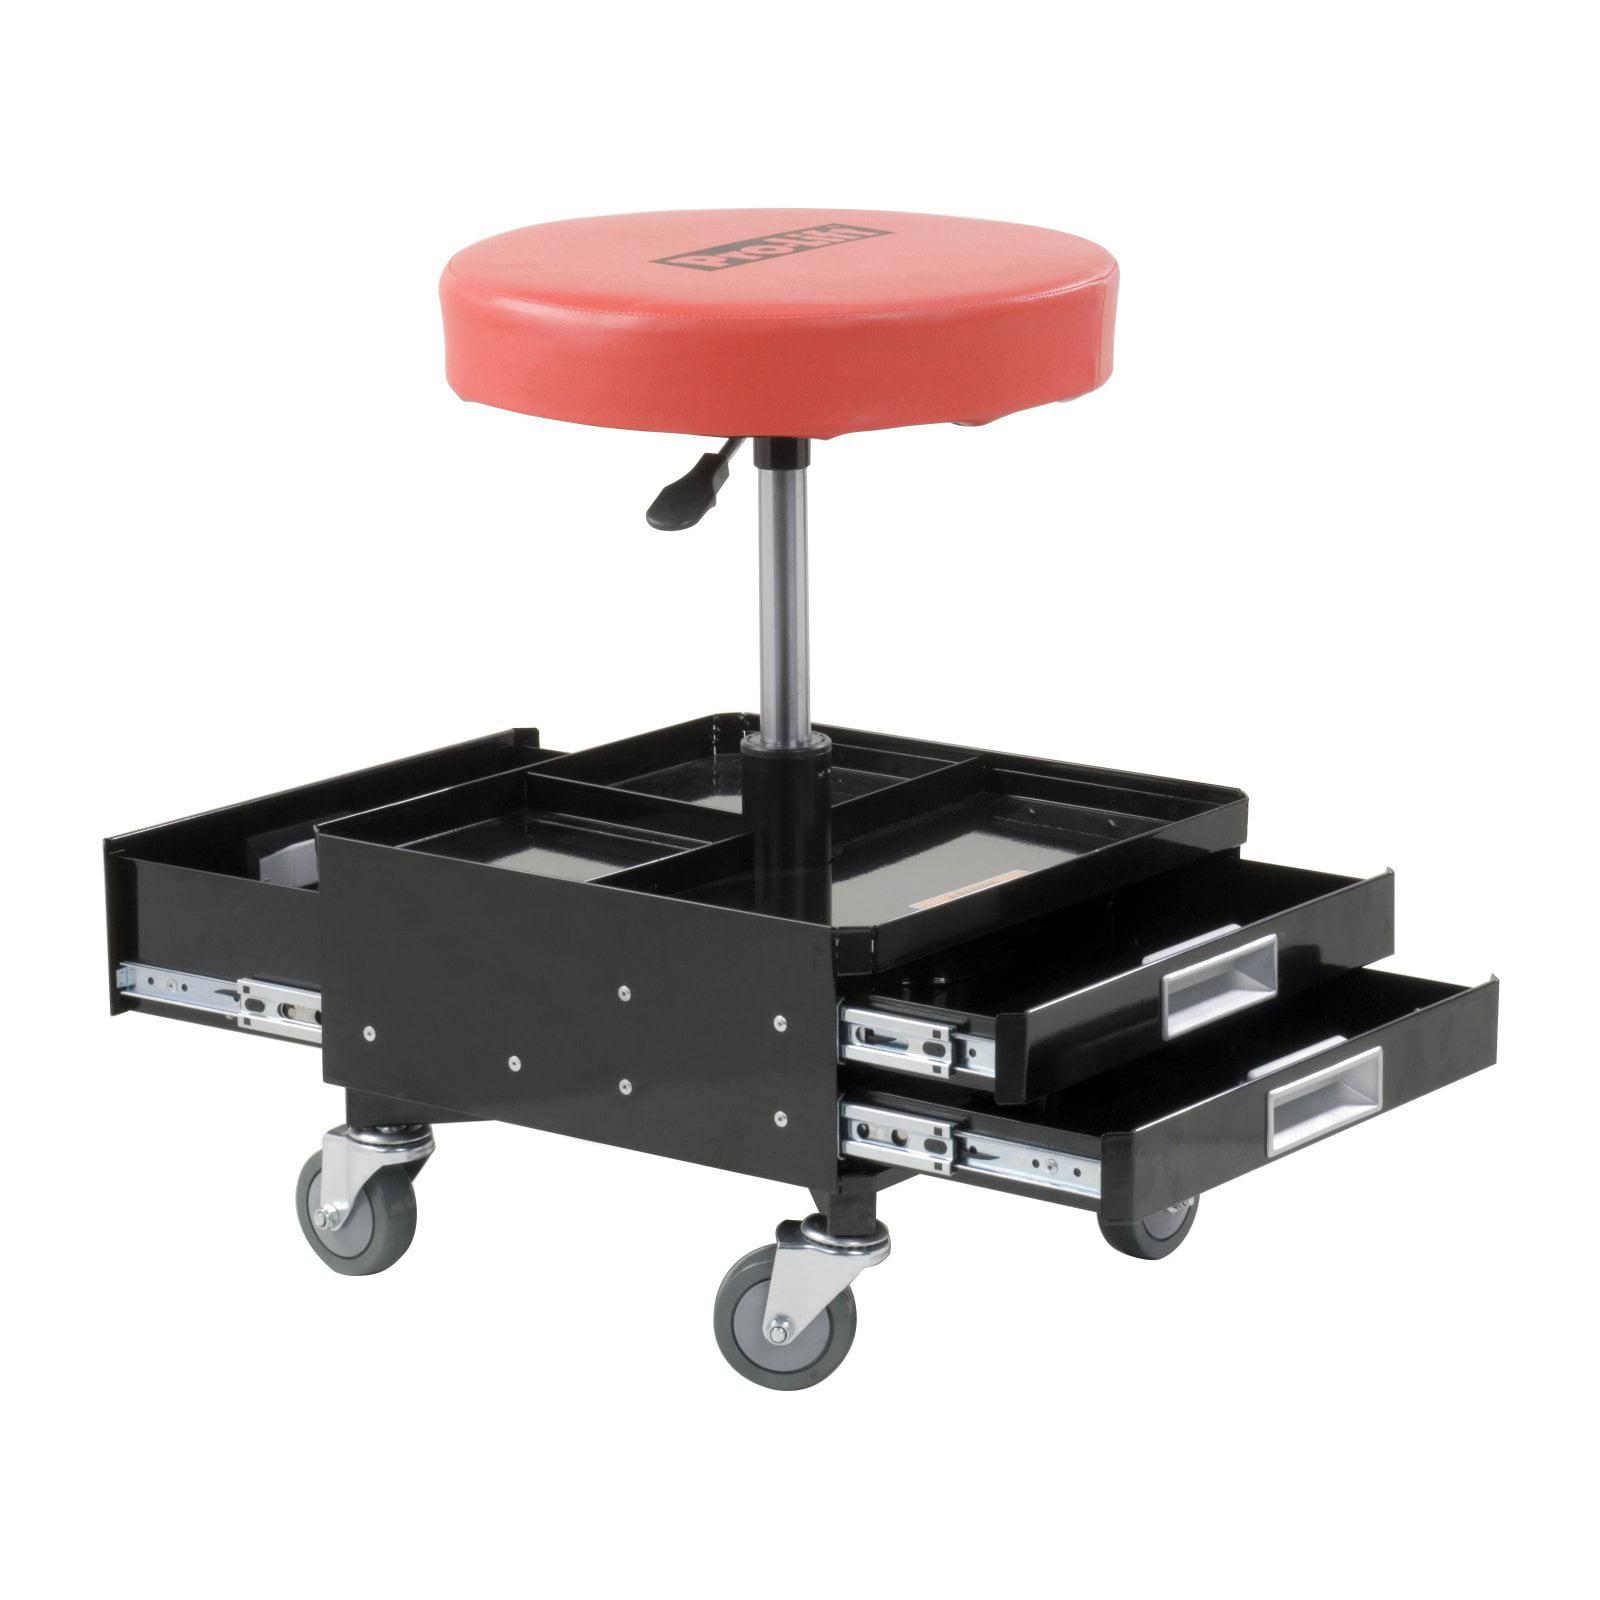 WEN Rolling Mechanic Stool 300 lb Capacity Seat Garage Roller Chair Pneumatic